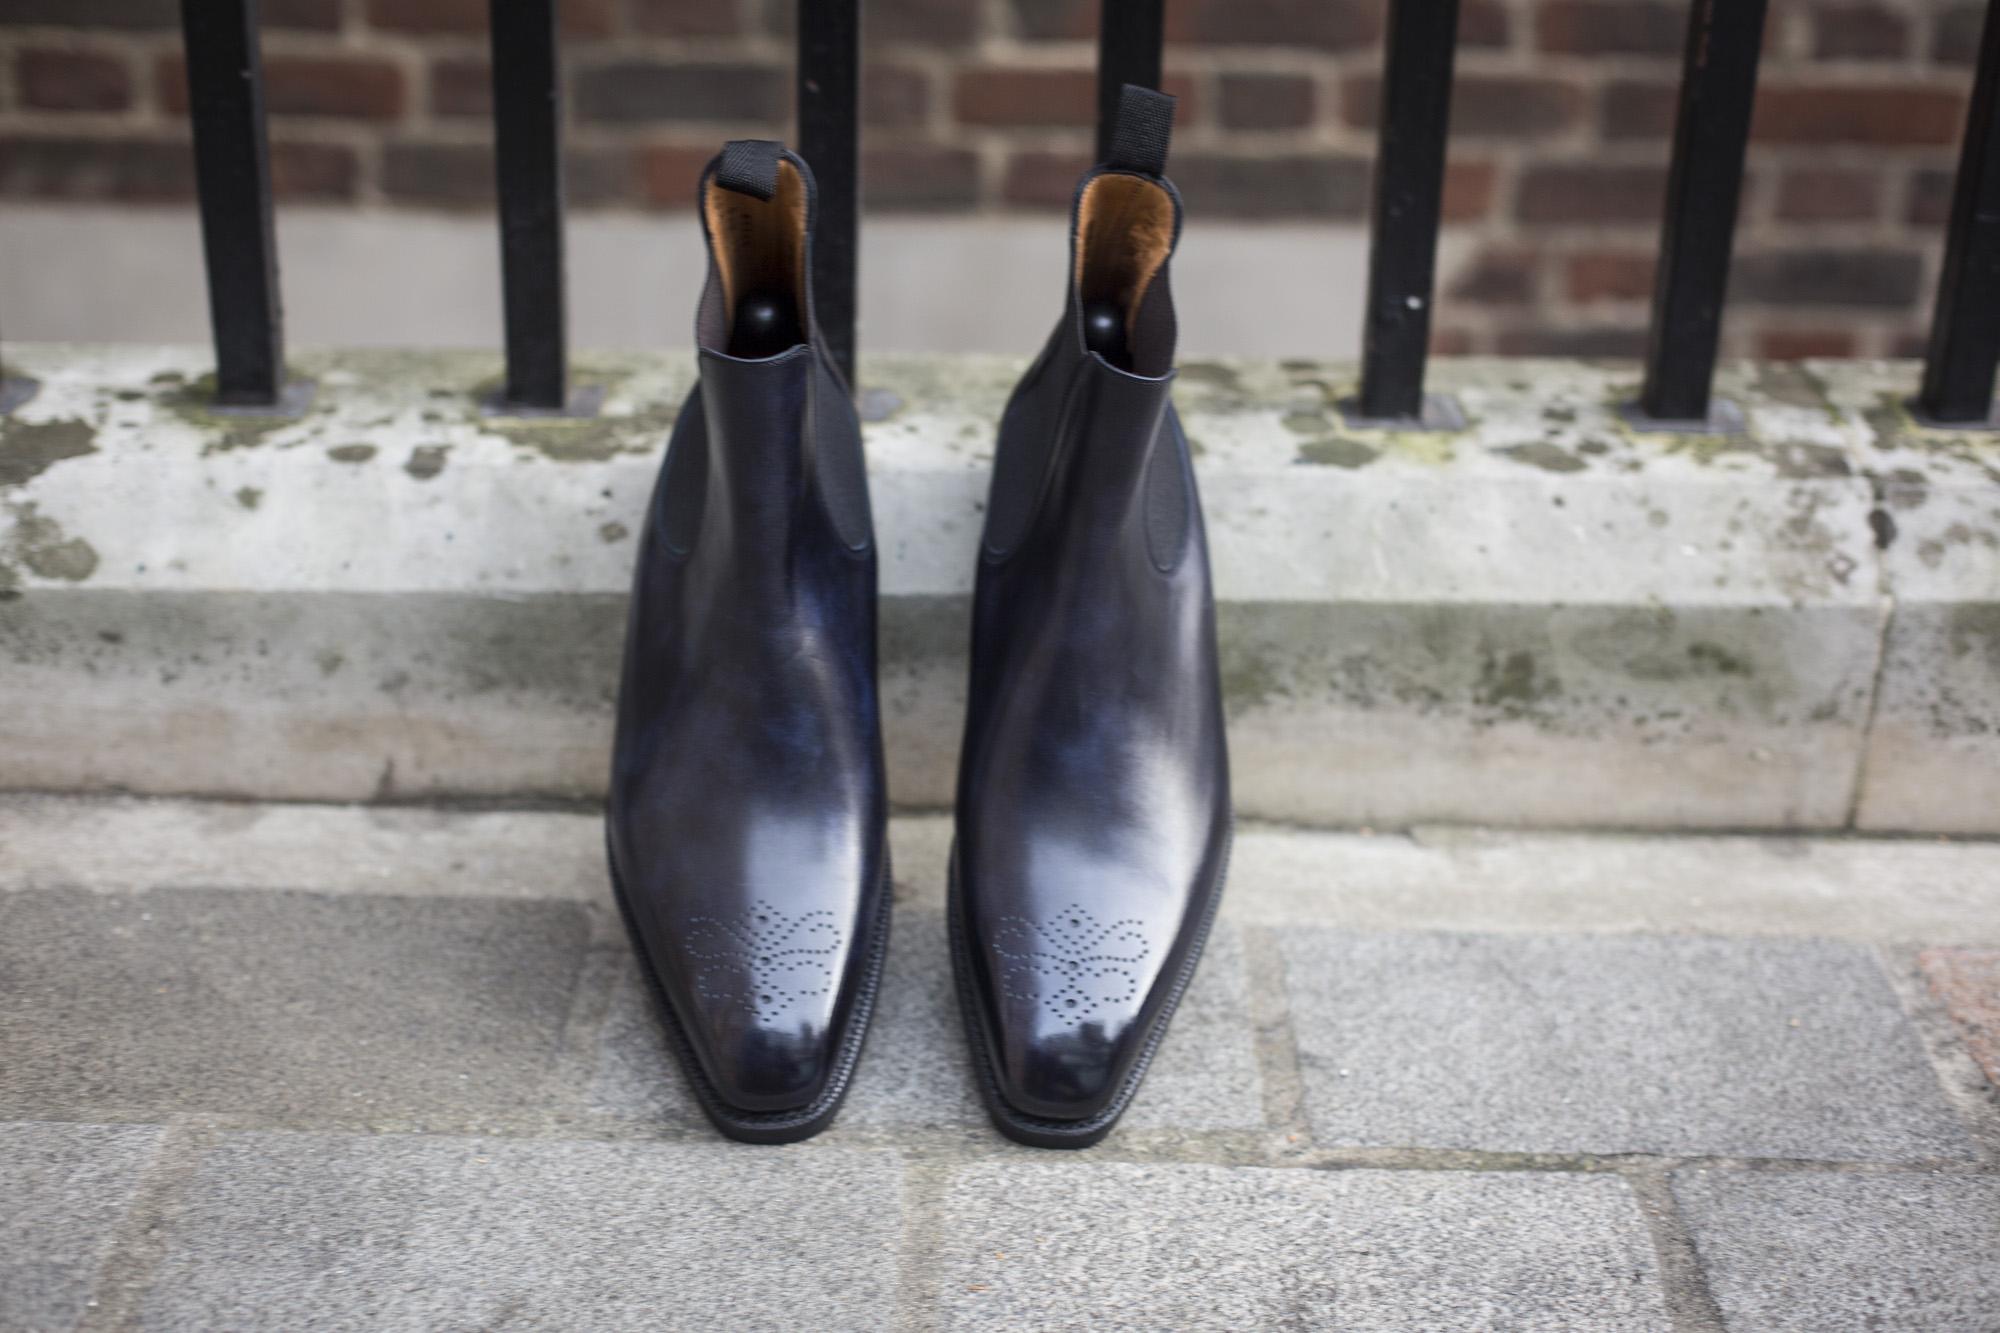 j-fitzpatrick-footwear-collection-9-november-2017-hero-singles-0184.jpg